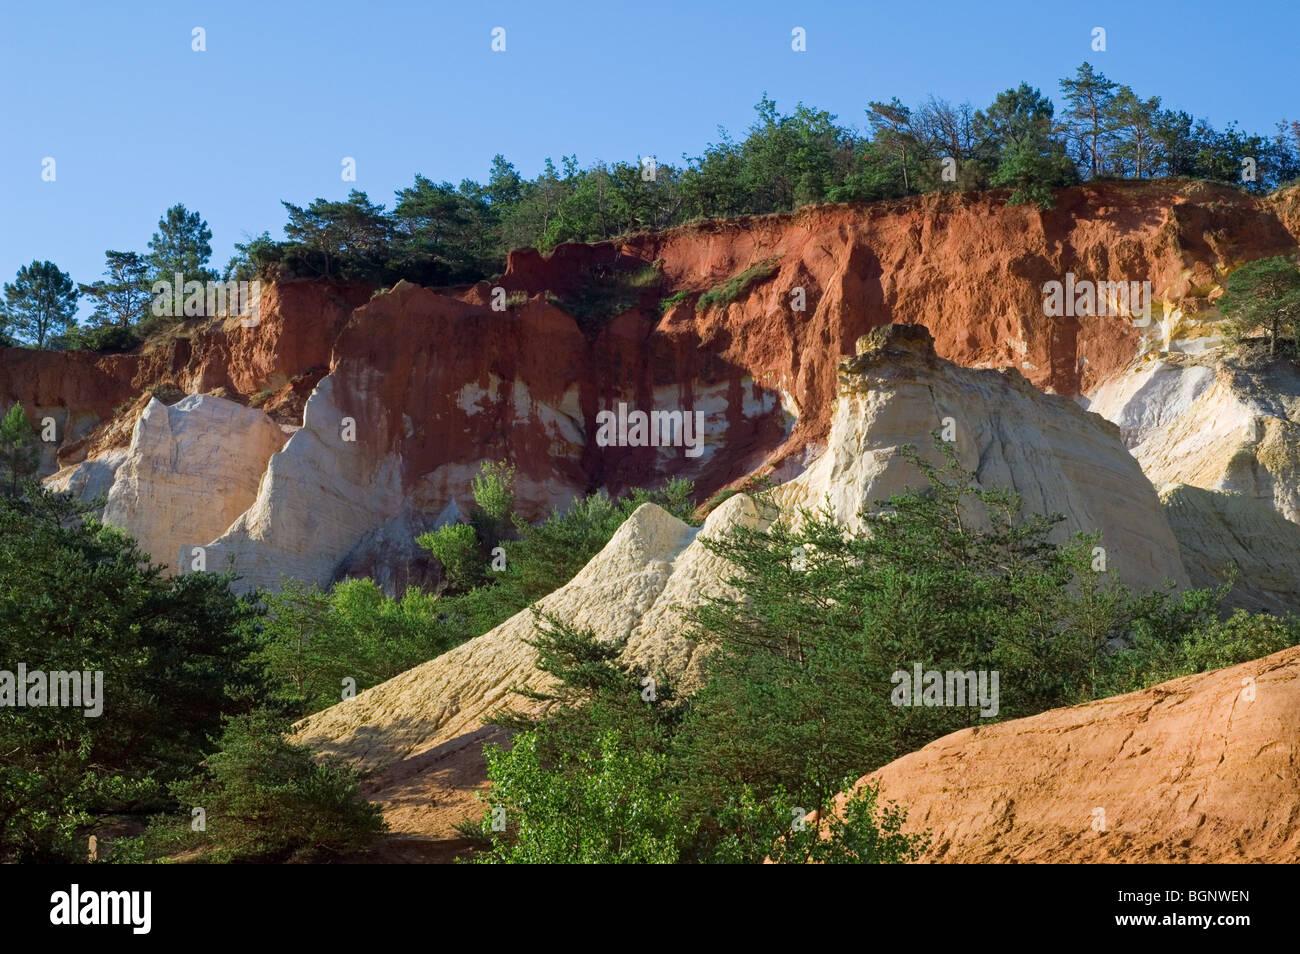 Rocks of the old ochre quarry, Colorado Provençal at Rustrel, Vaucluse, Provence-Alpes-Côte d'Azur, - Stock Image